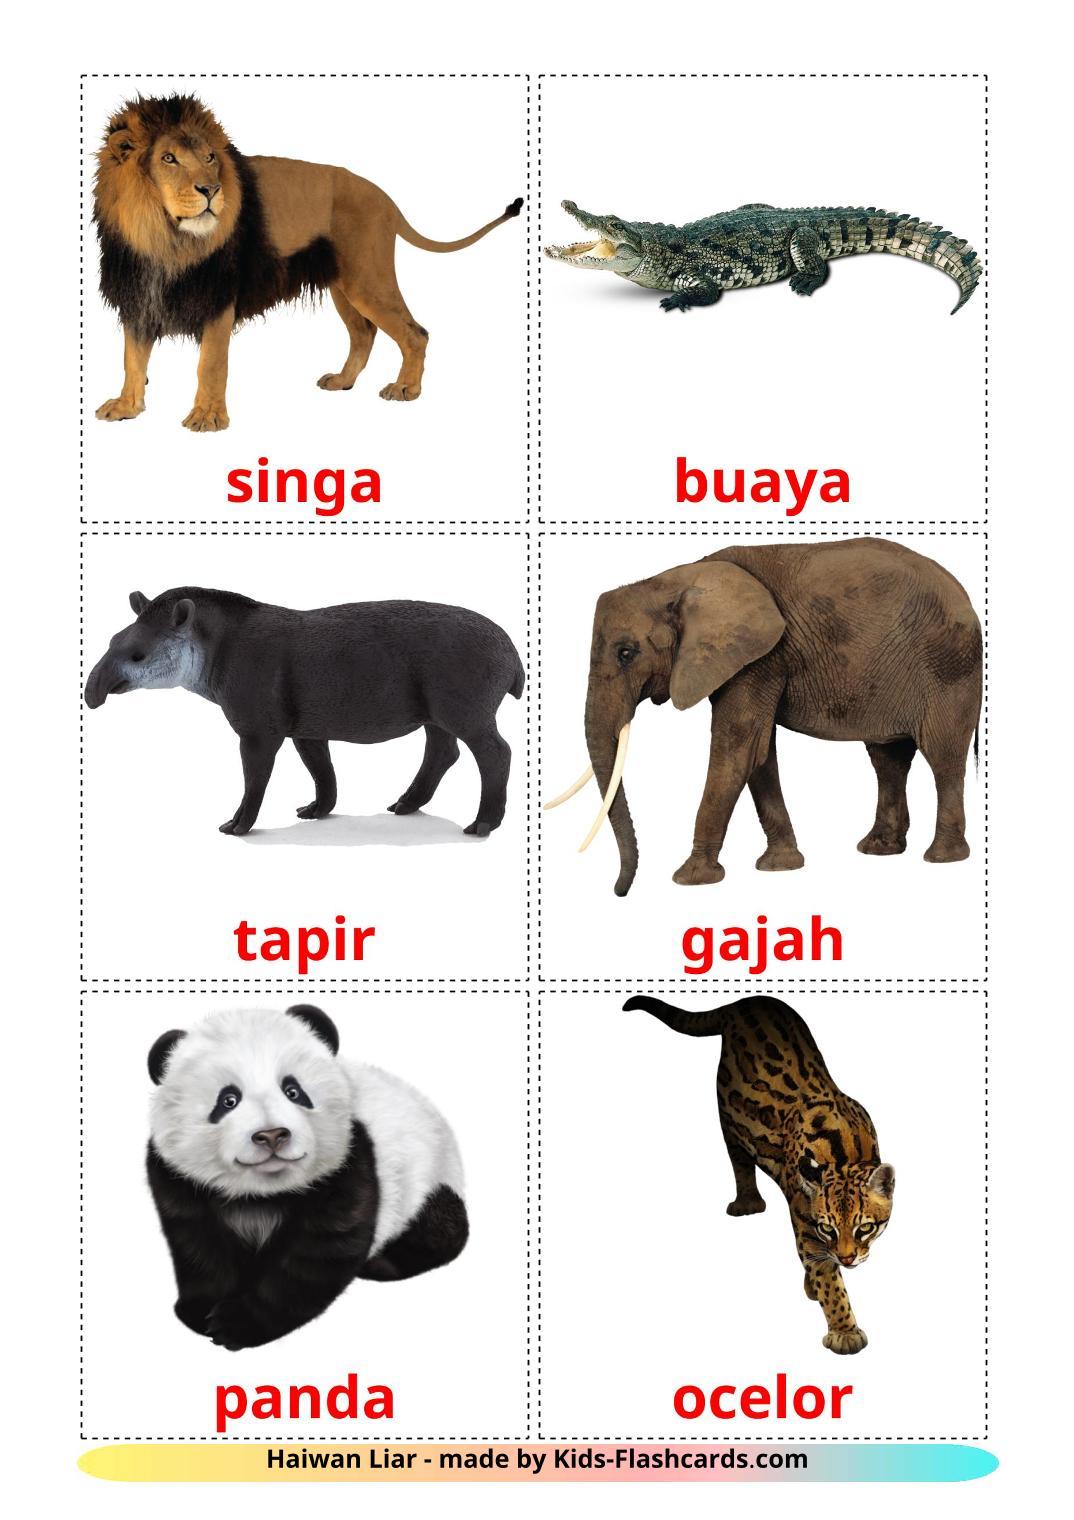 Jungle animals - 21 Free Printable malay Flashcards